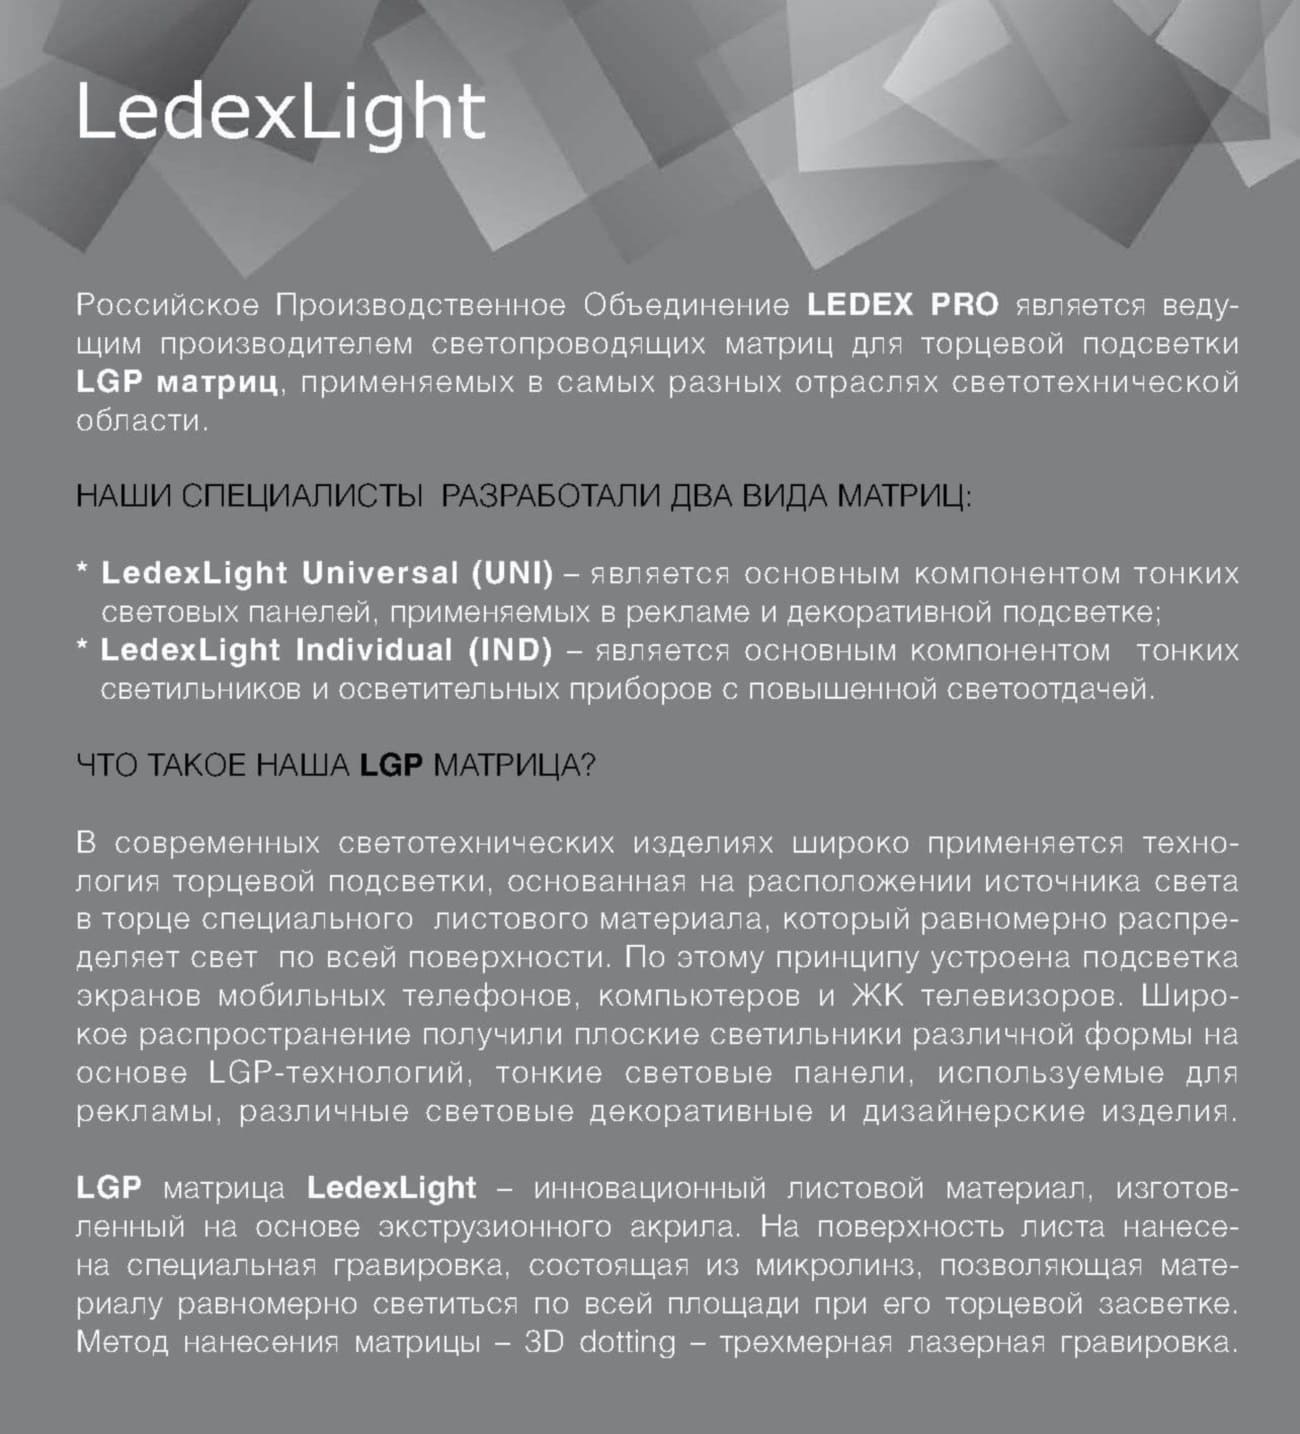 Ledexlight